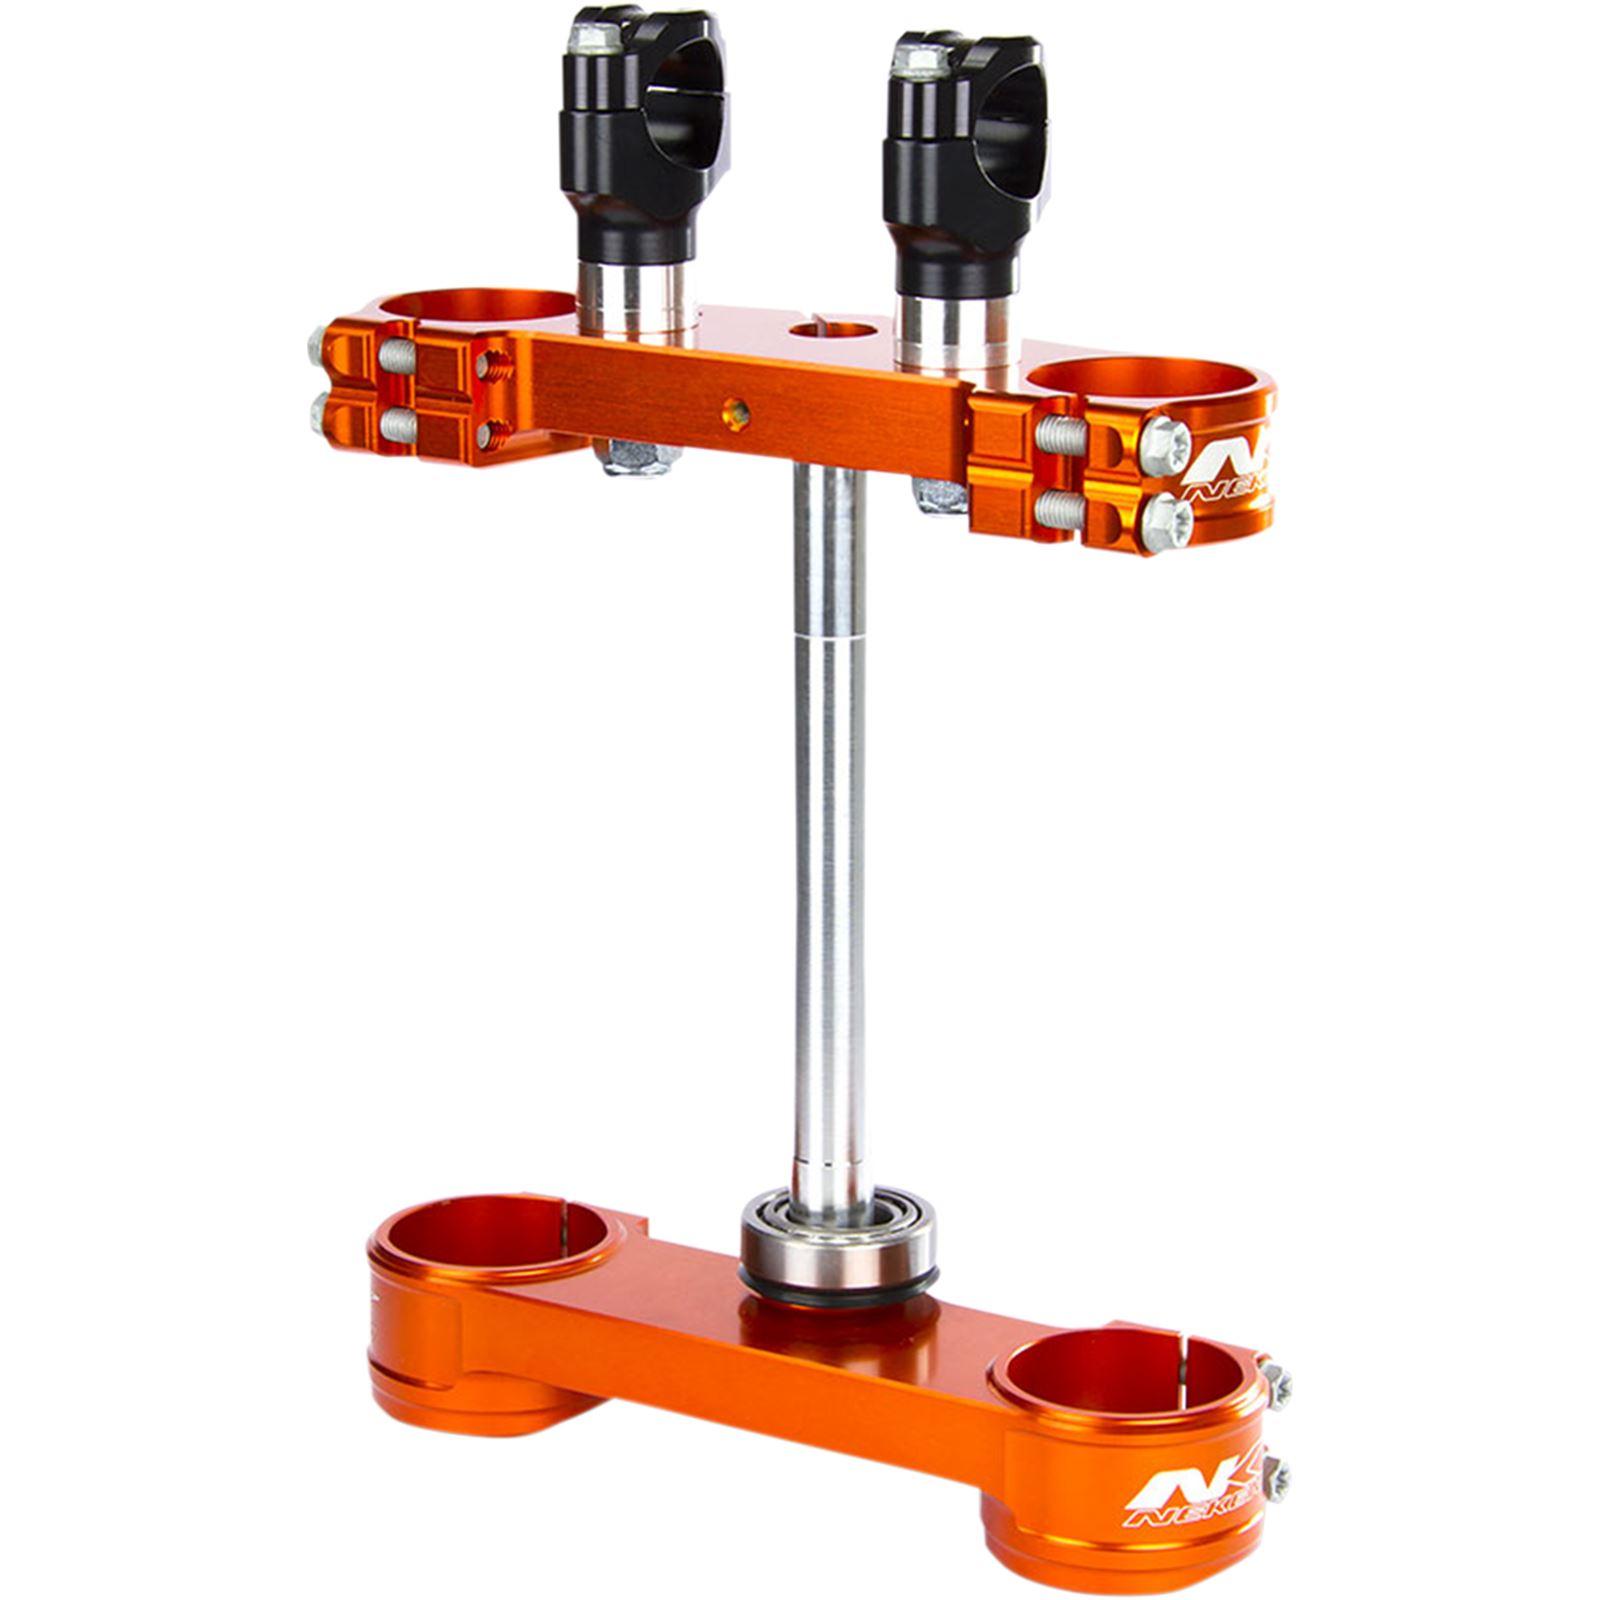 Neken Triple Clamp SX65 - Orange